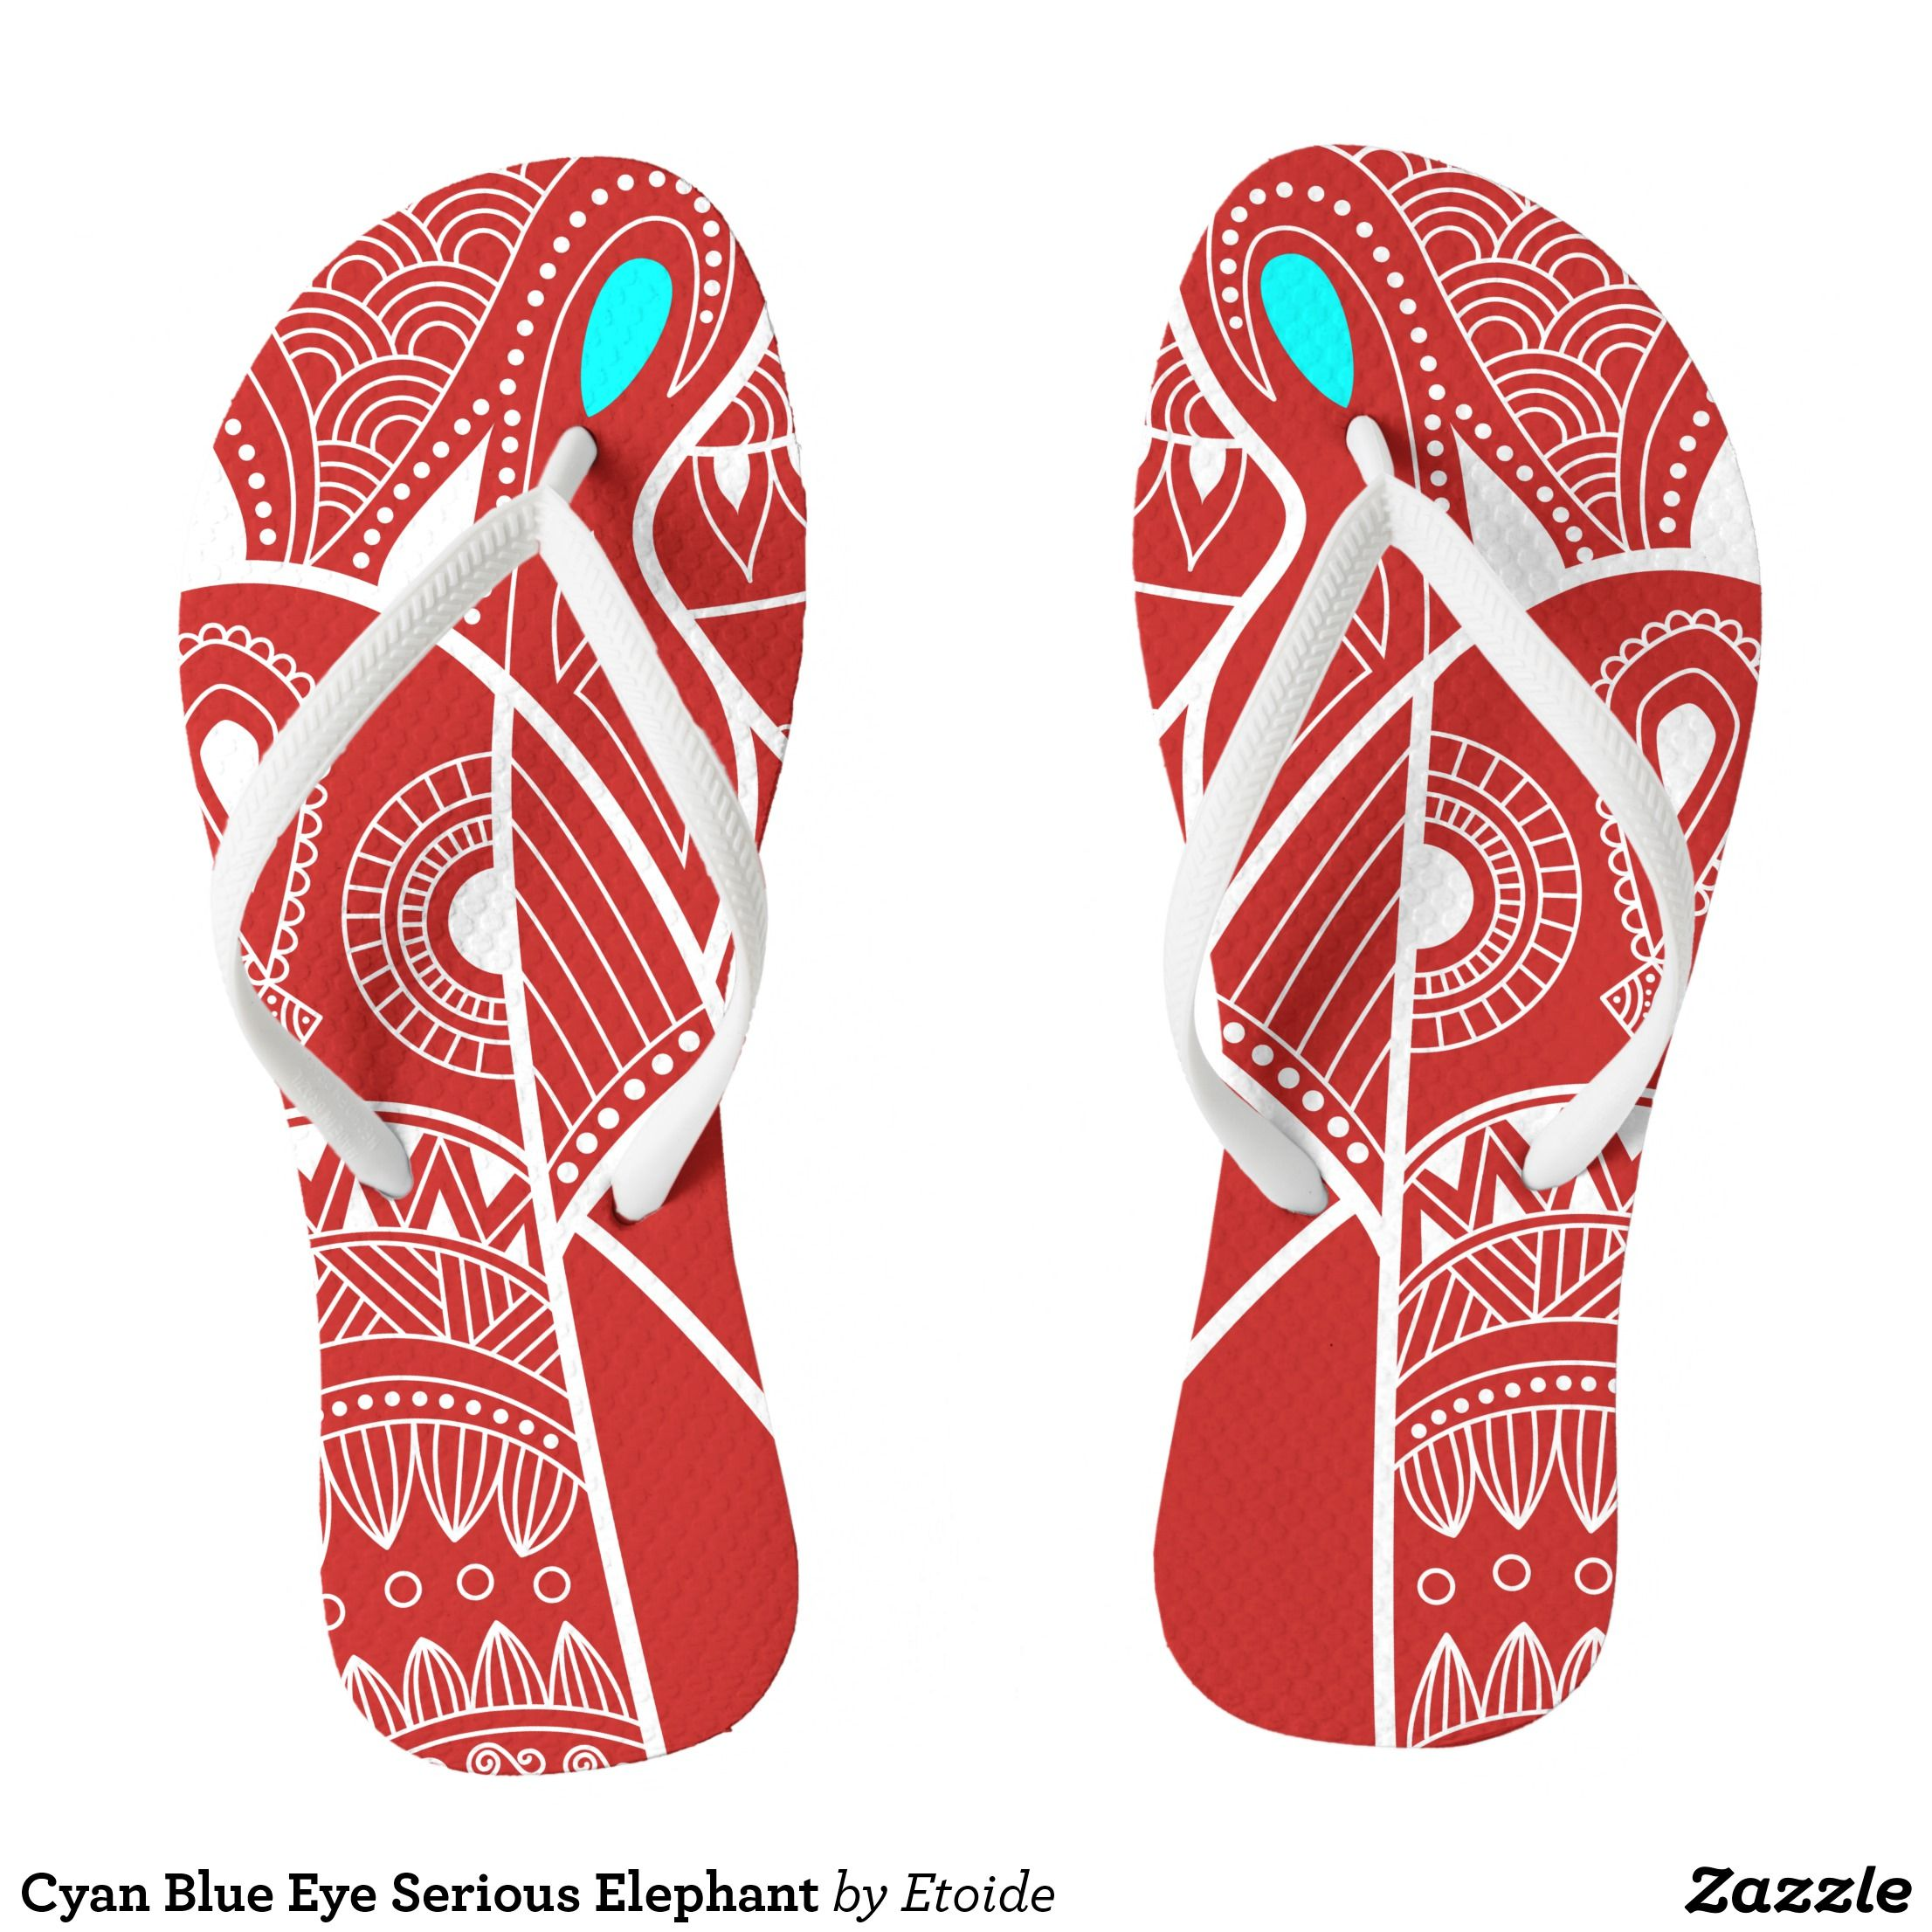 Cyan Blue Eye Serious Elephant Flip Flops Durable Style Hawaiian Beach Sandals By Talented Fashion Graphic Designers Flipflops Hawaii